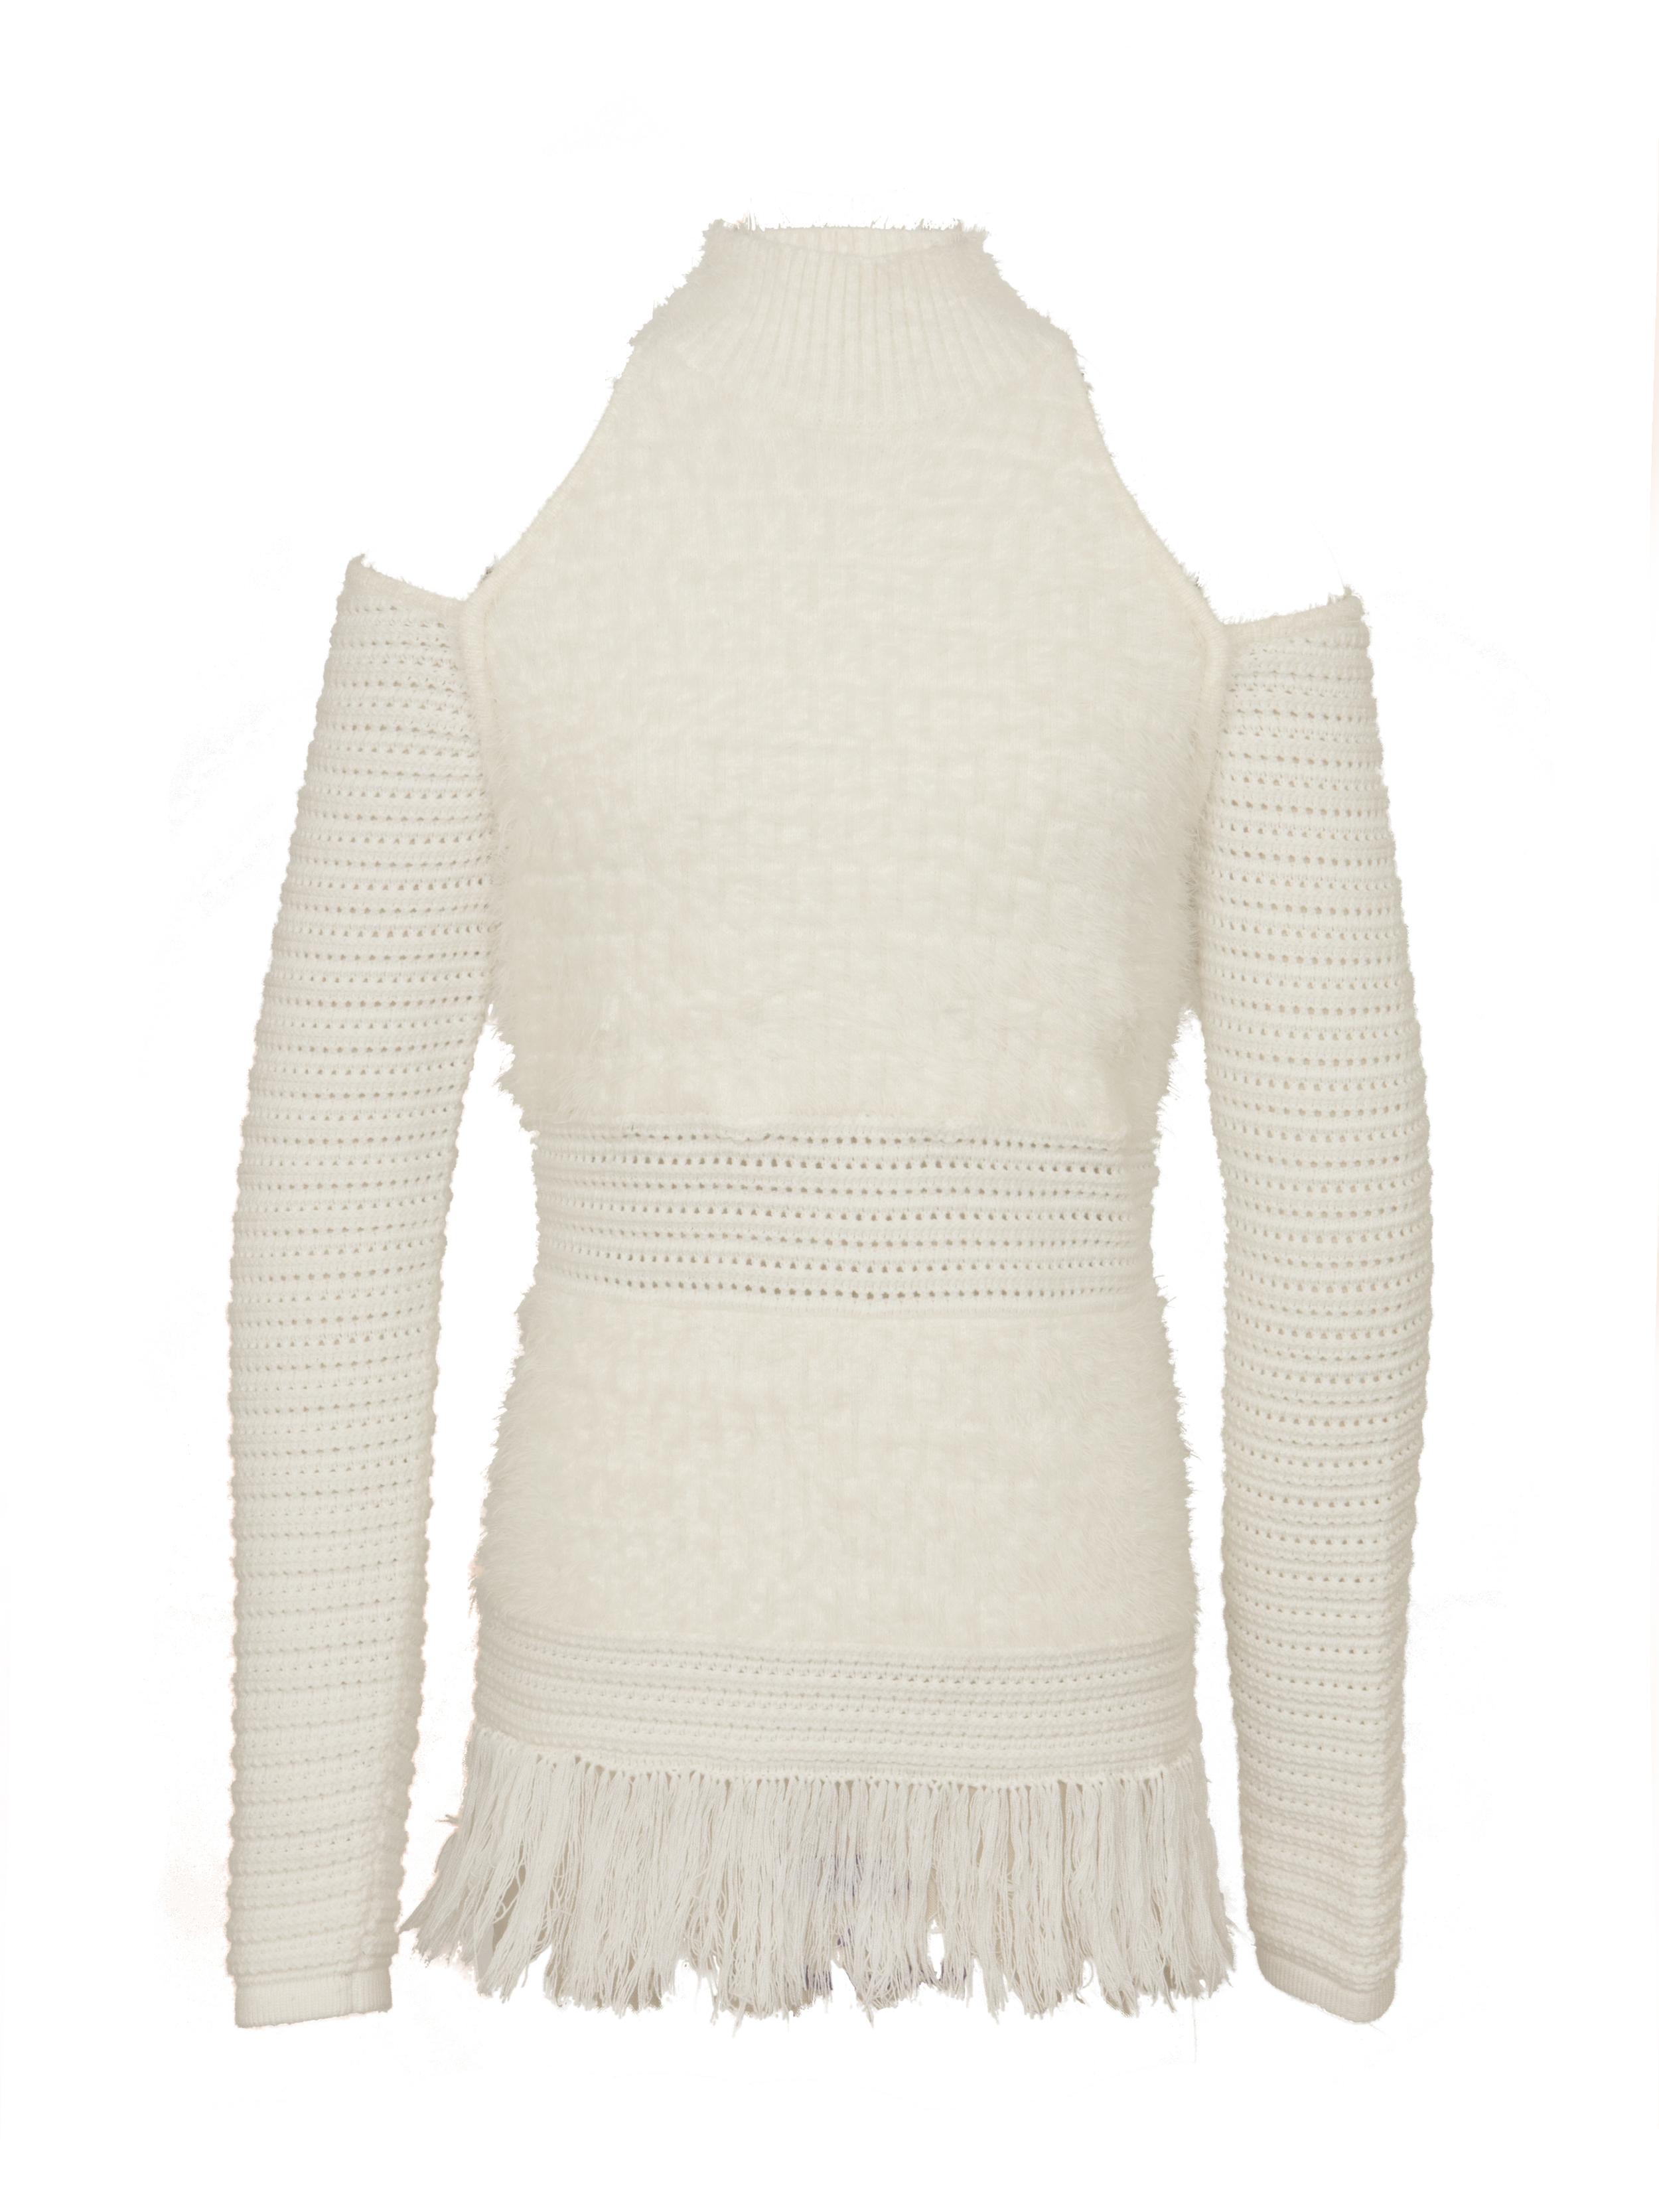 P2063-K, Fringe Pointelle Cold Shoulder Tunic, Ivory.jpg